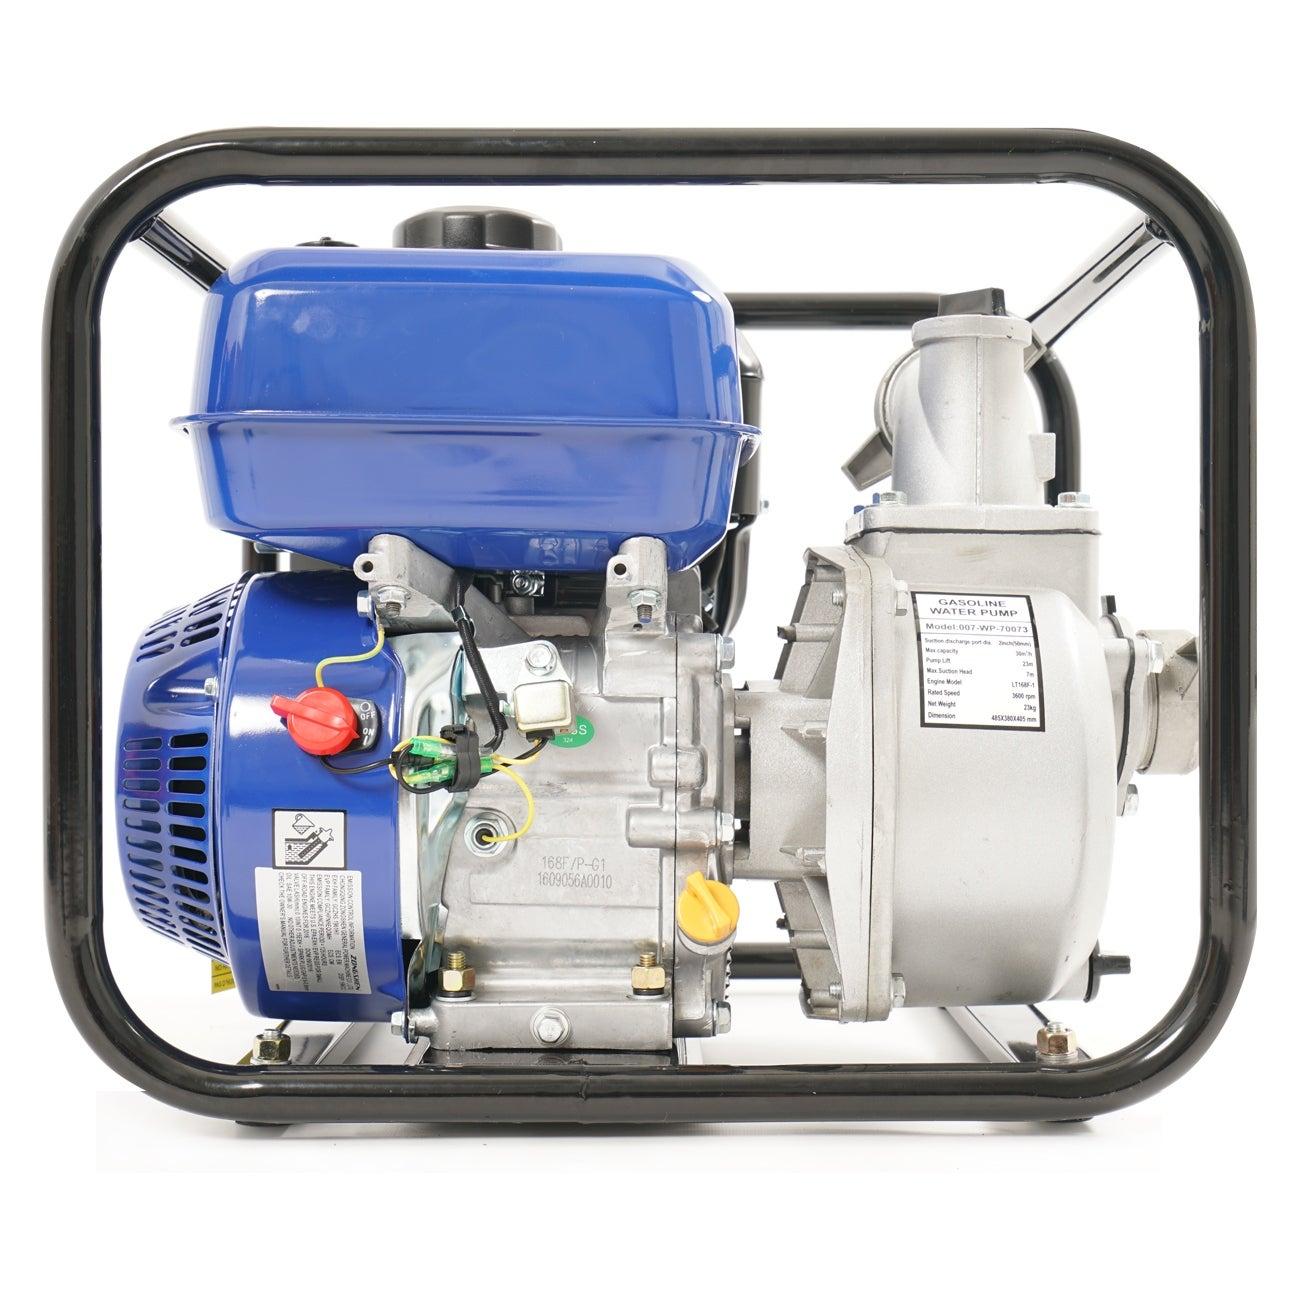 Shop Arksen 65 Hp 2 Gas Power Semi Trash Water Pump Drain 132gpm Horsepower 4 5 Model 5hp Stroke Flood Irrigation Ships To Canada 15912324